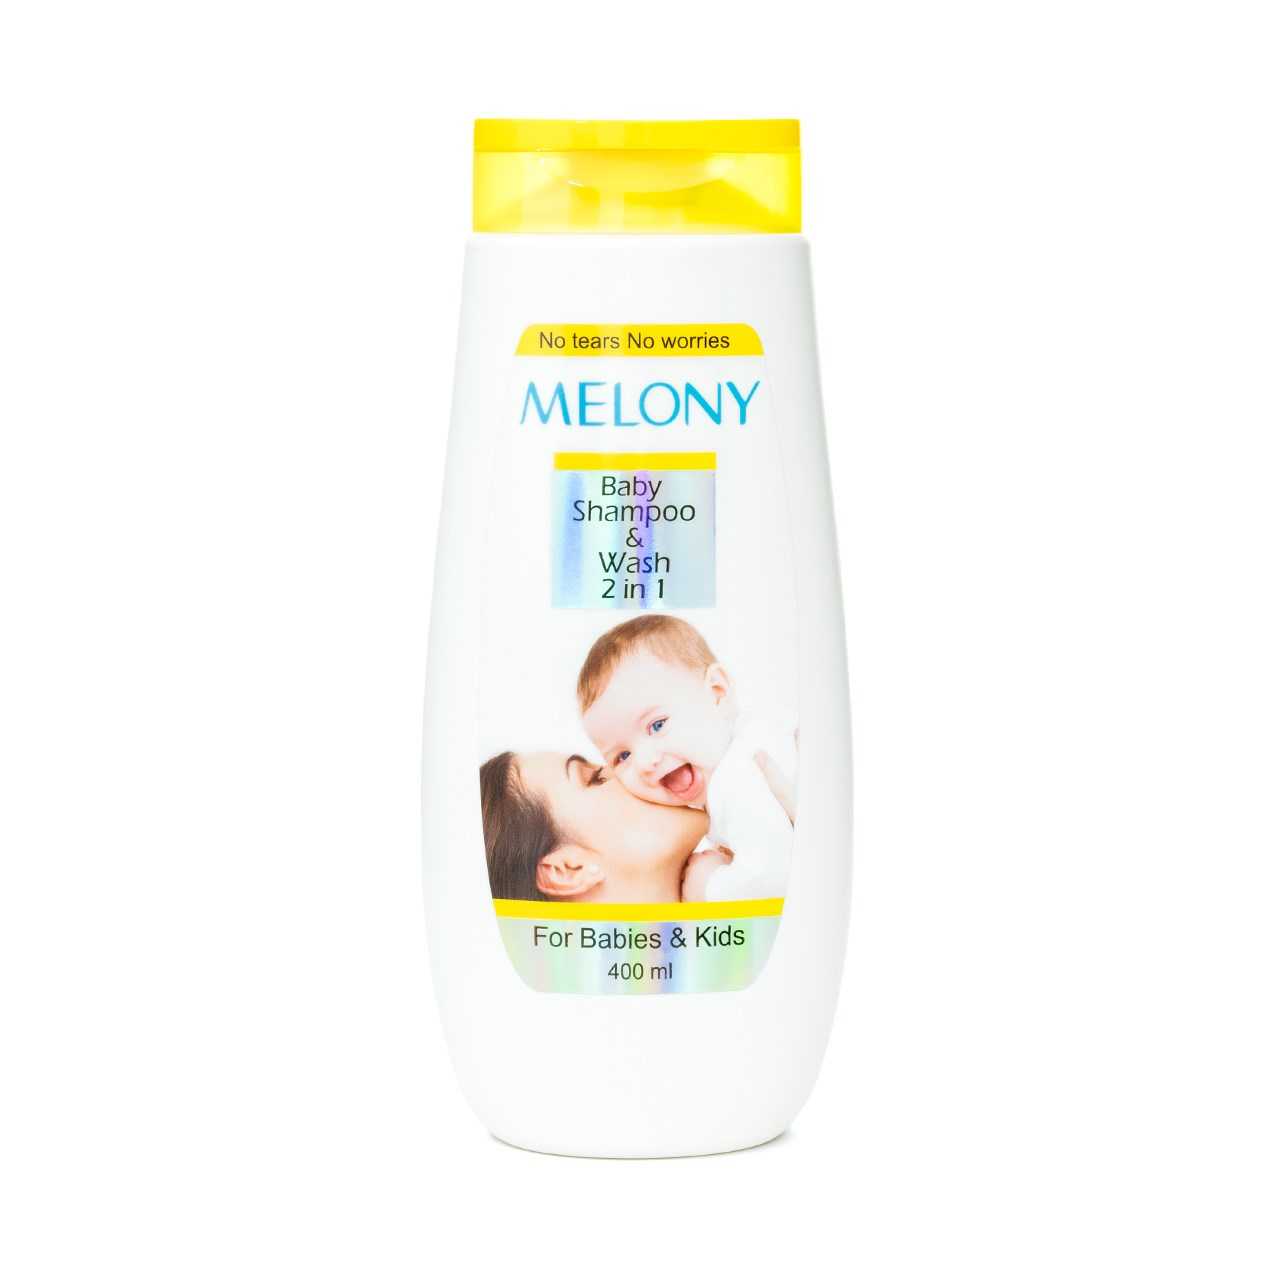 شامپو سر و بدن کودک ملونی مدل Baby Shampoo and Wash حجم 400 میلی لیتر